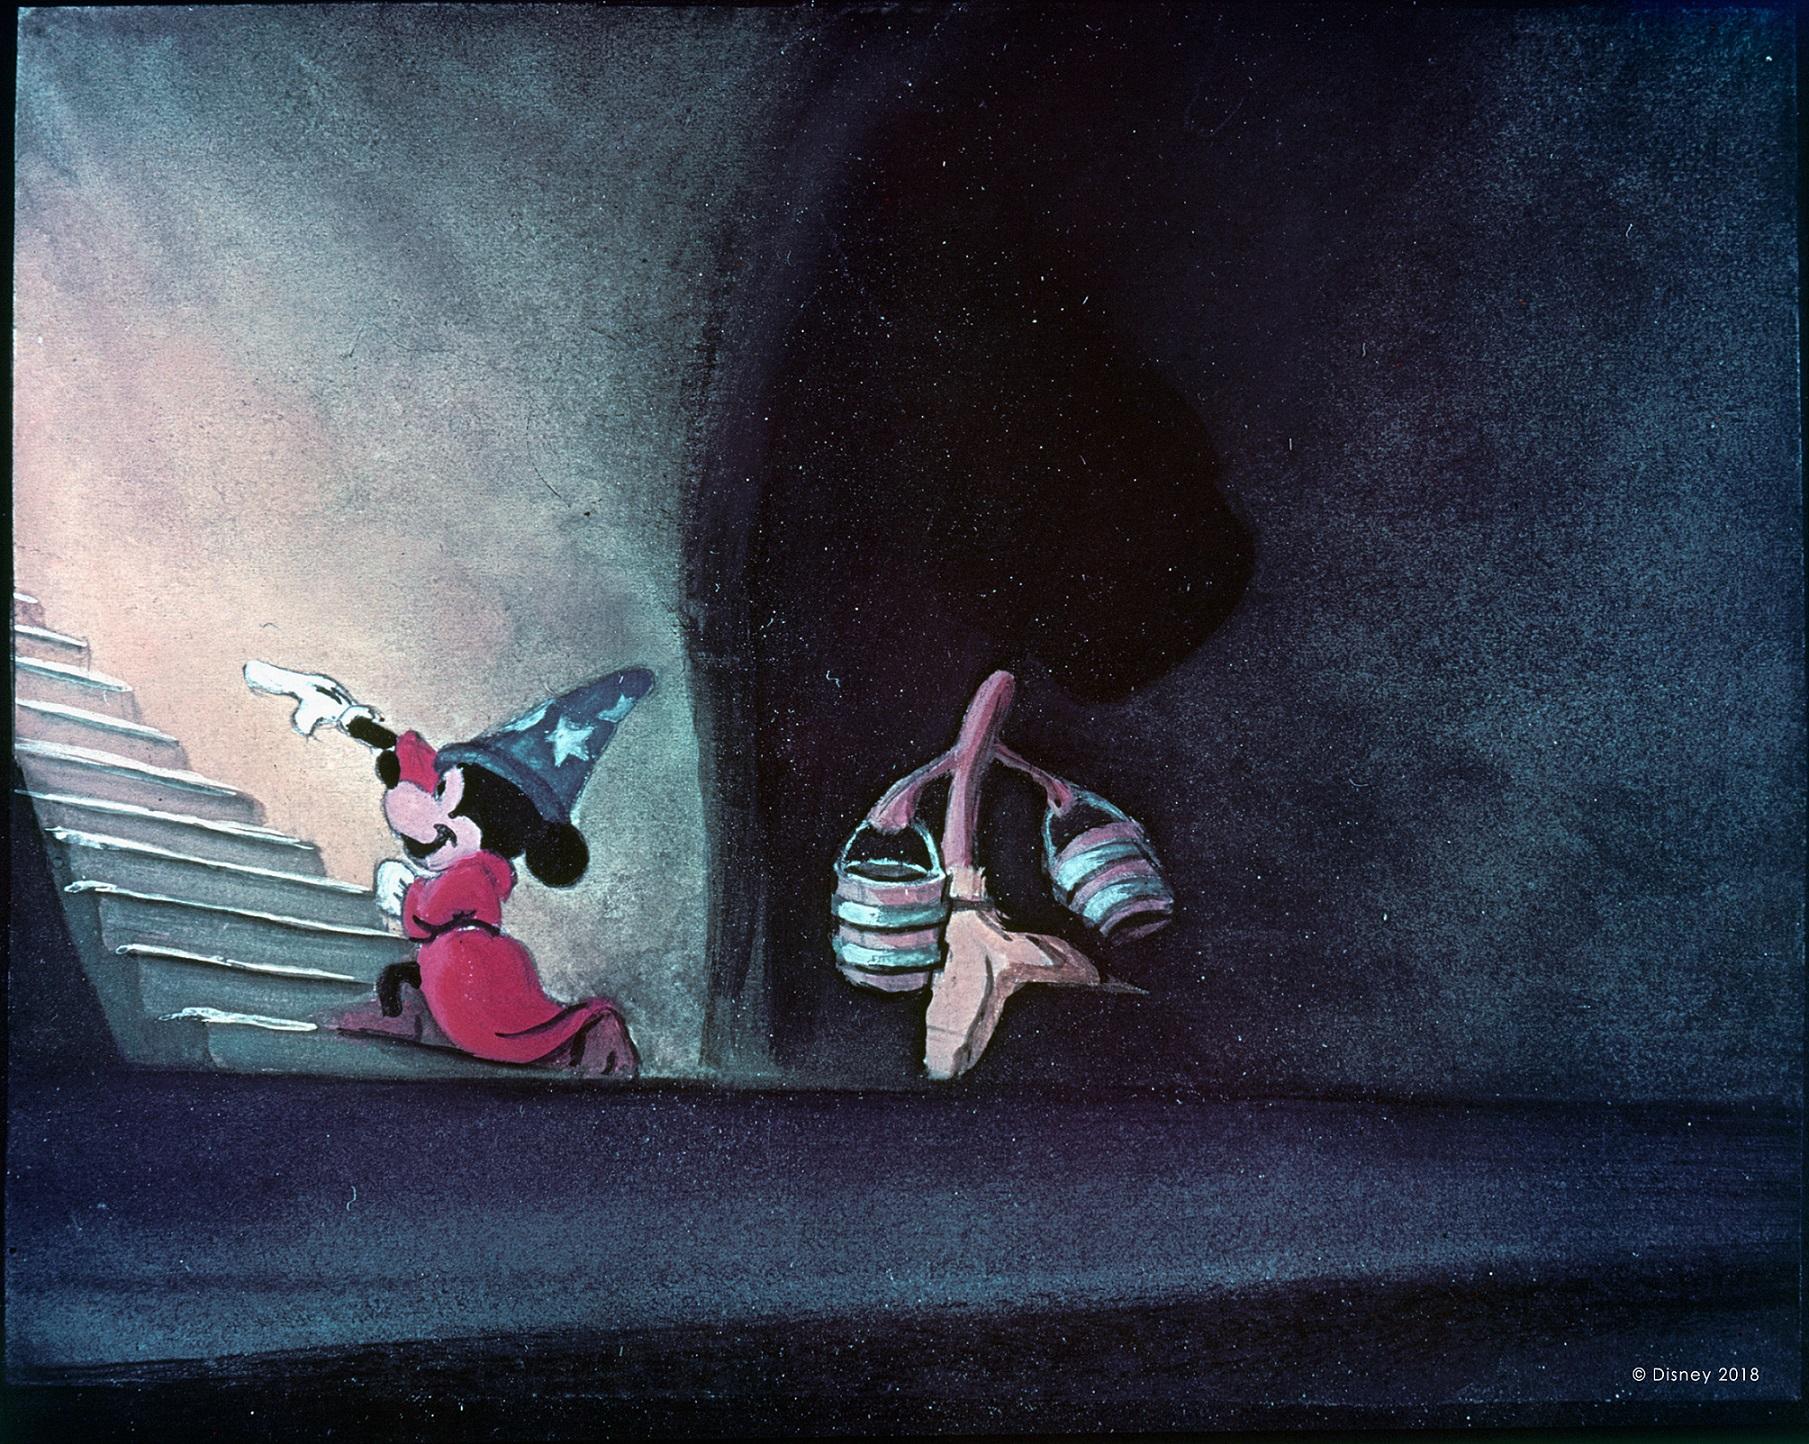 Artwork of Sorcerer's Apprentice Mickey from Walt Disney's Fantasia